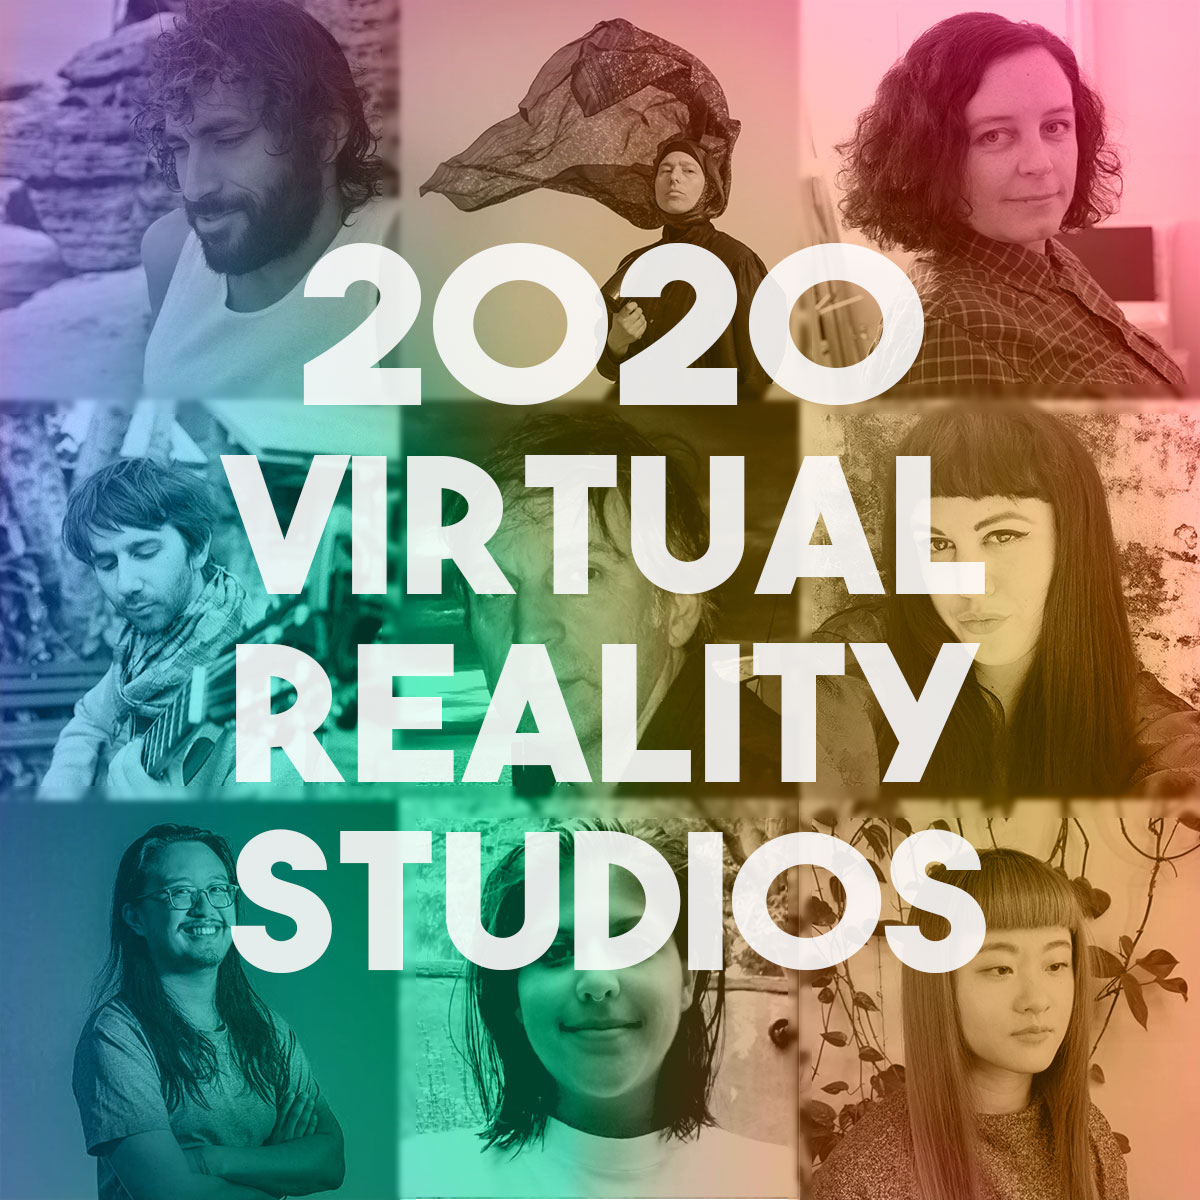 2020 VR Studio